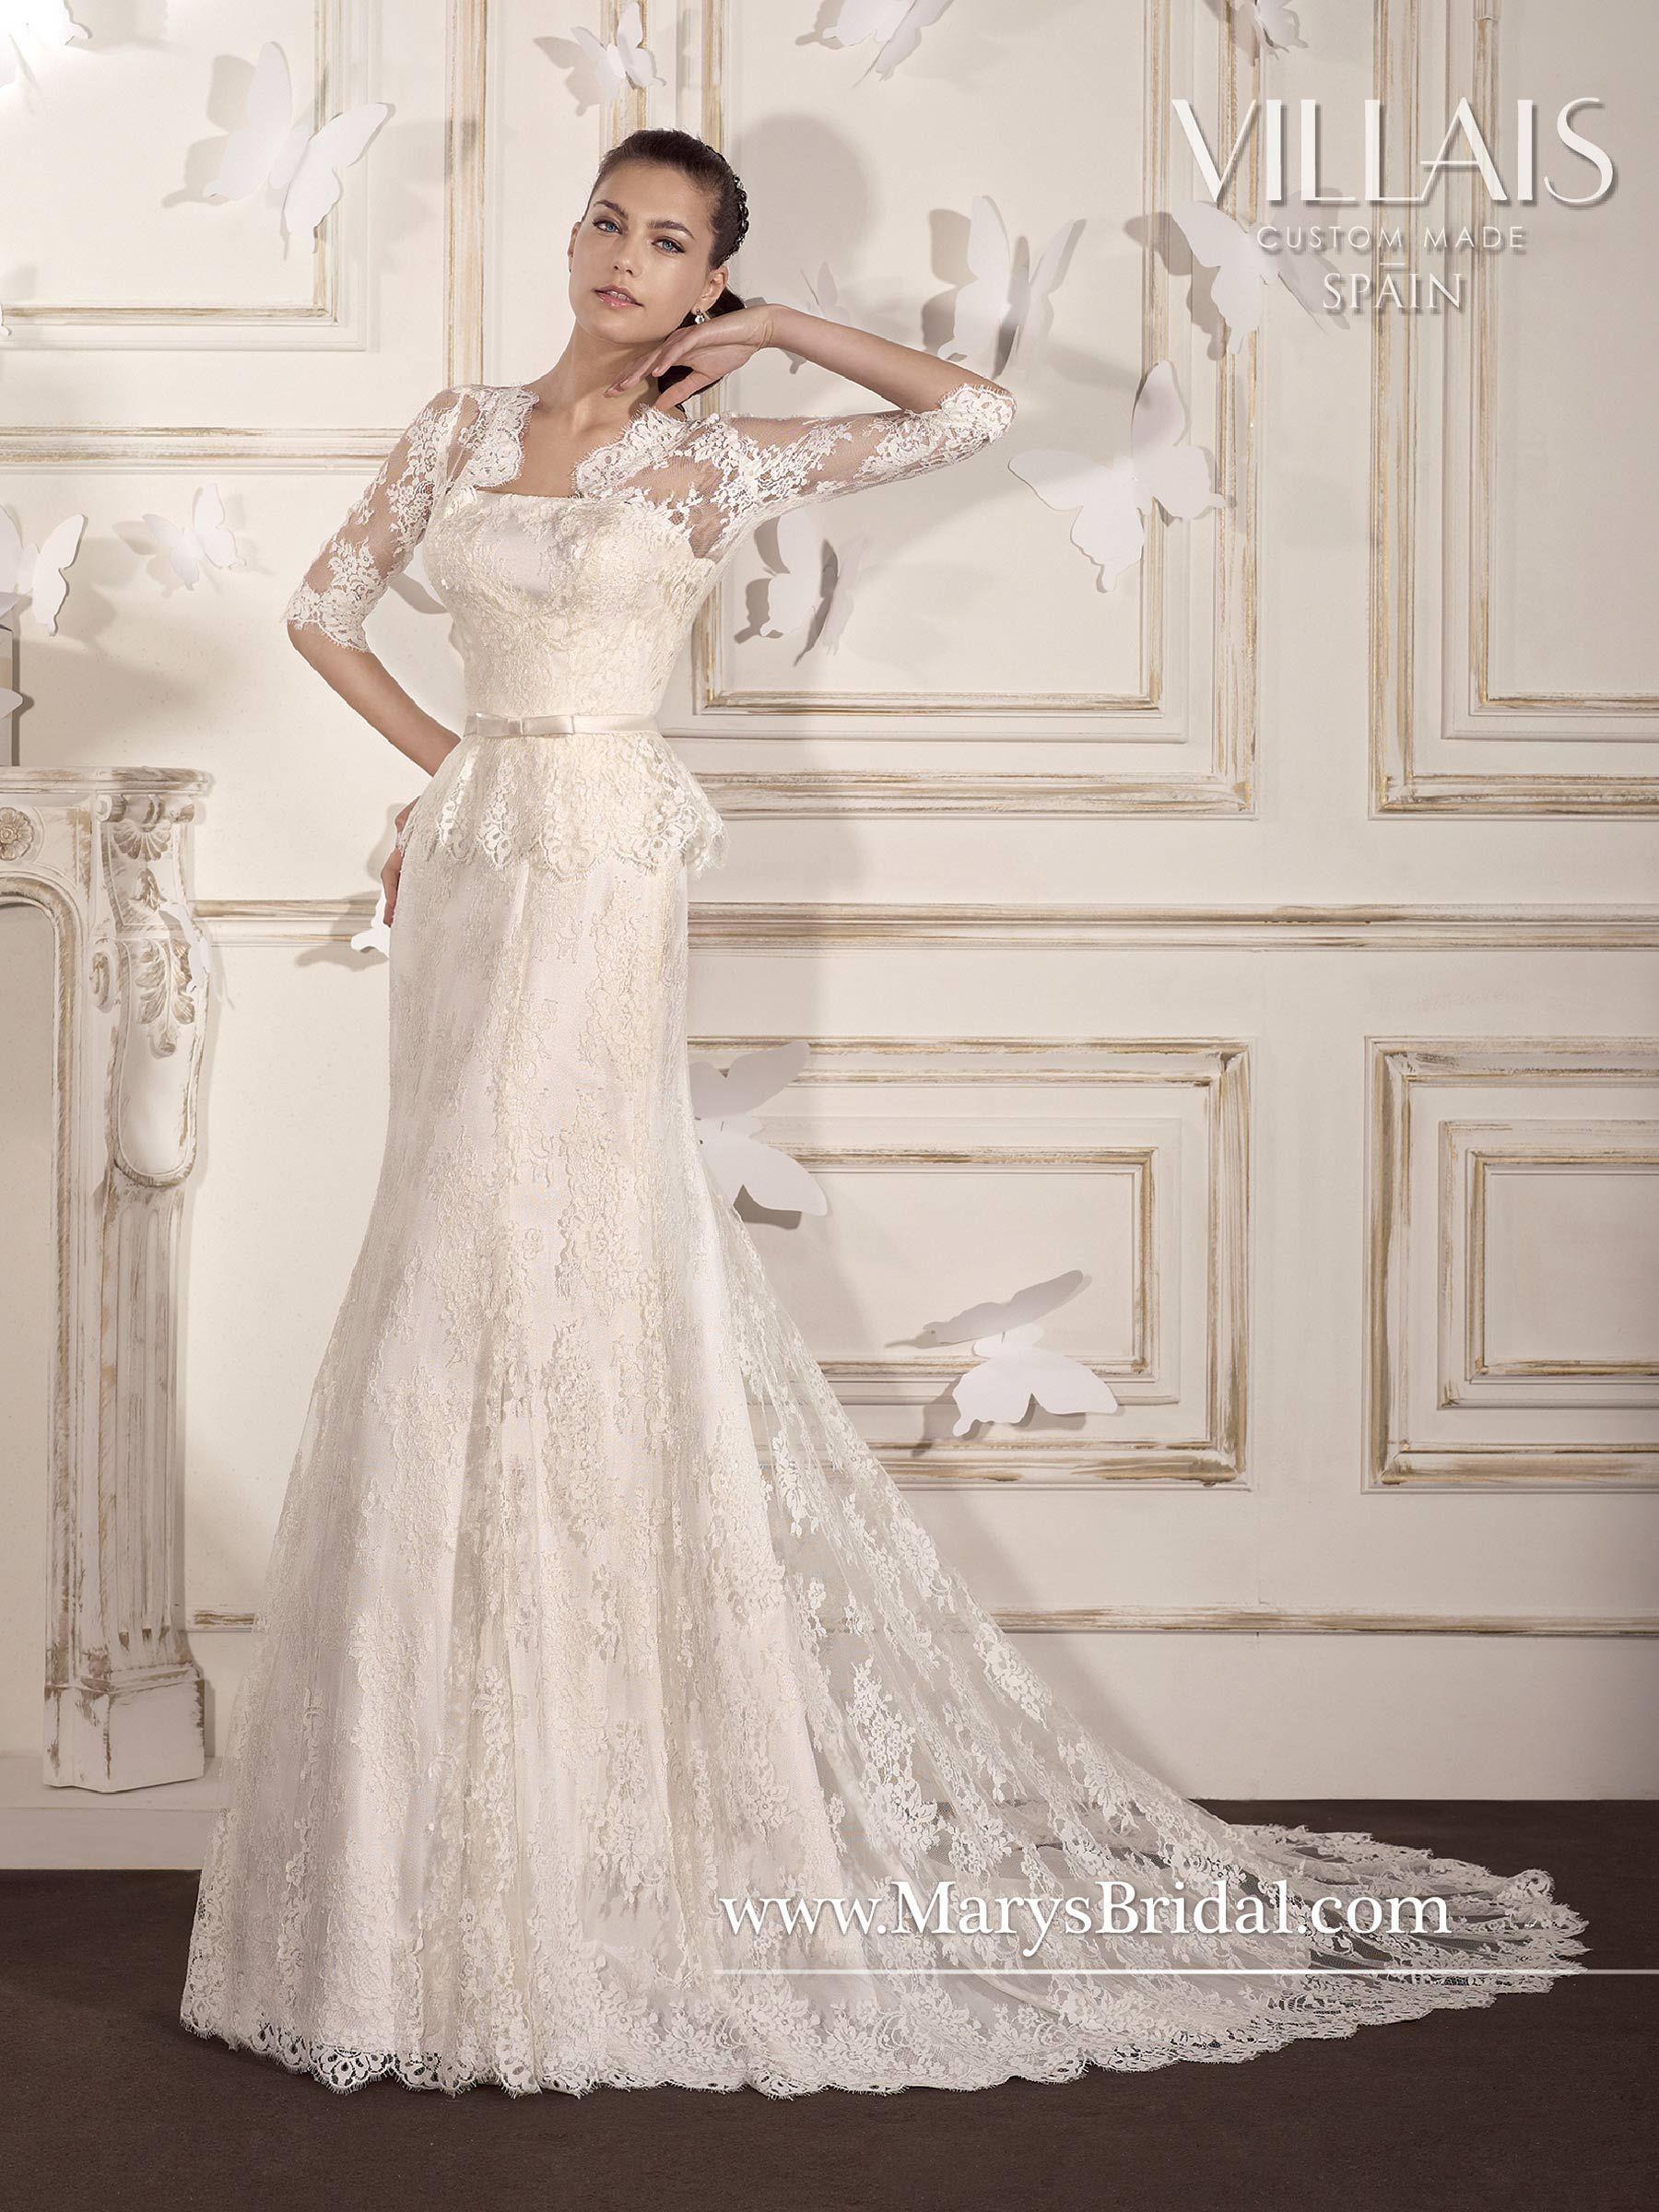 9febc61e1b9 Custom Wedding Dresses Austin Tx - Gomes Weine AG